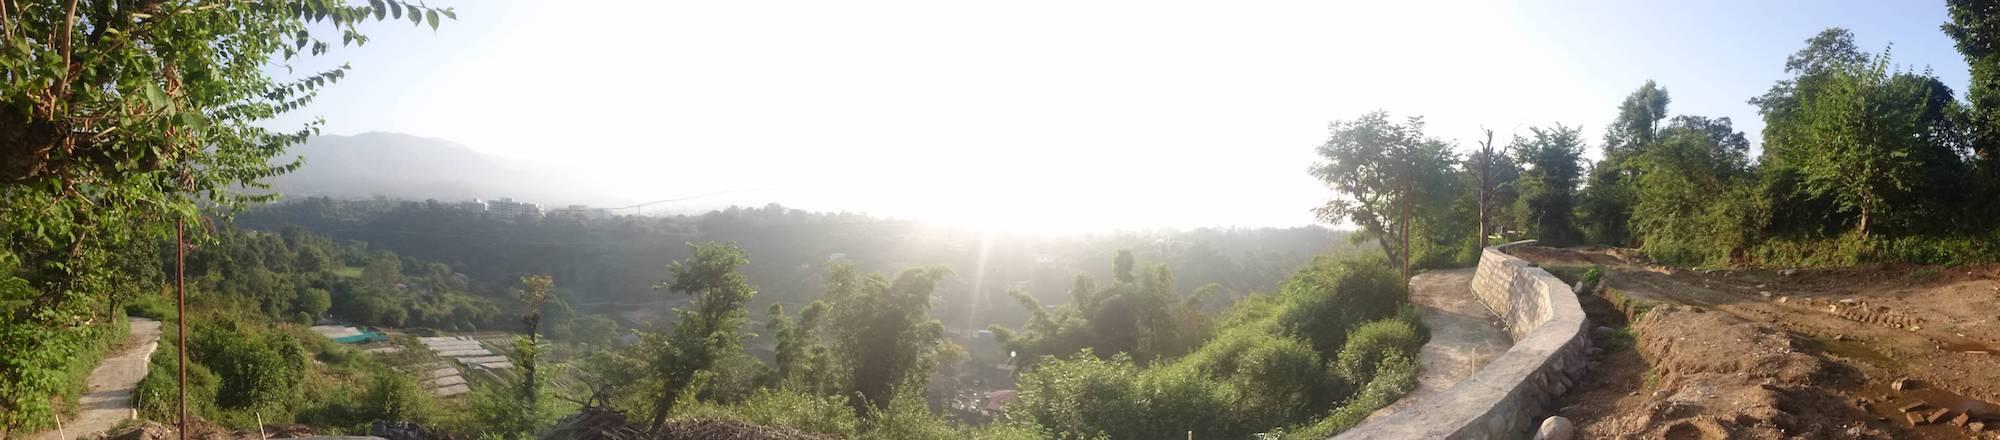 Dehradun-panirama-view-cover